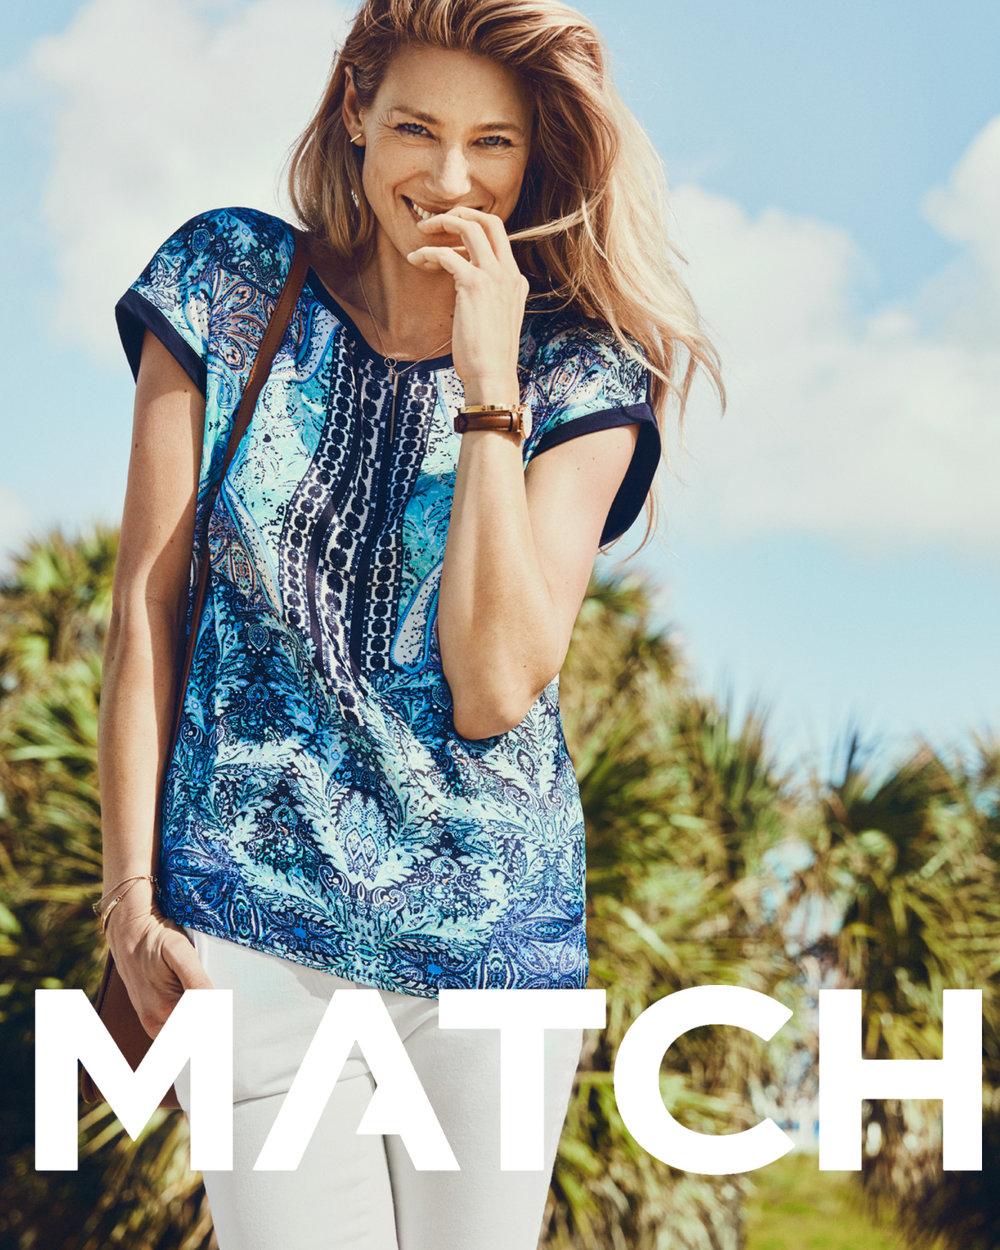 match11.jpg